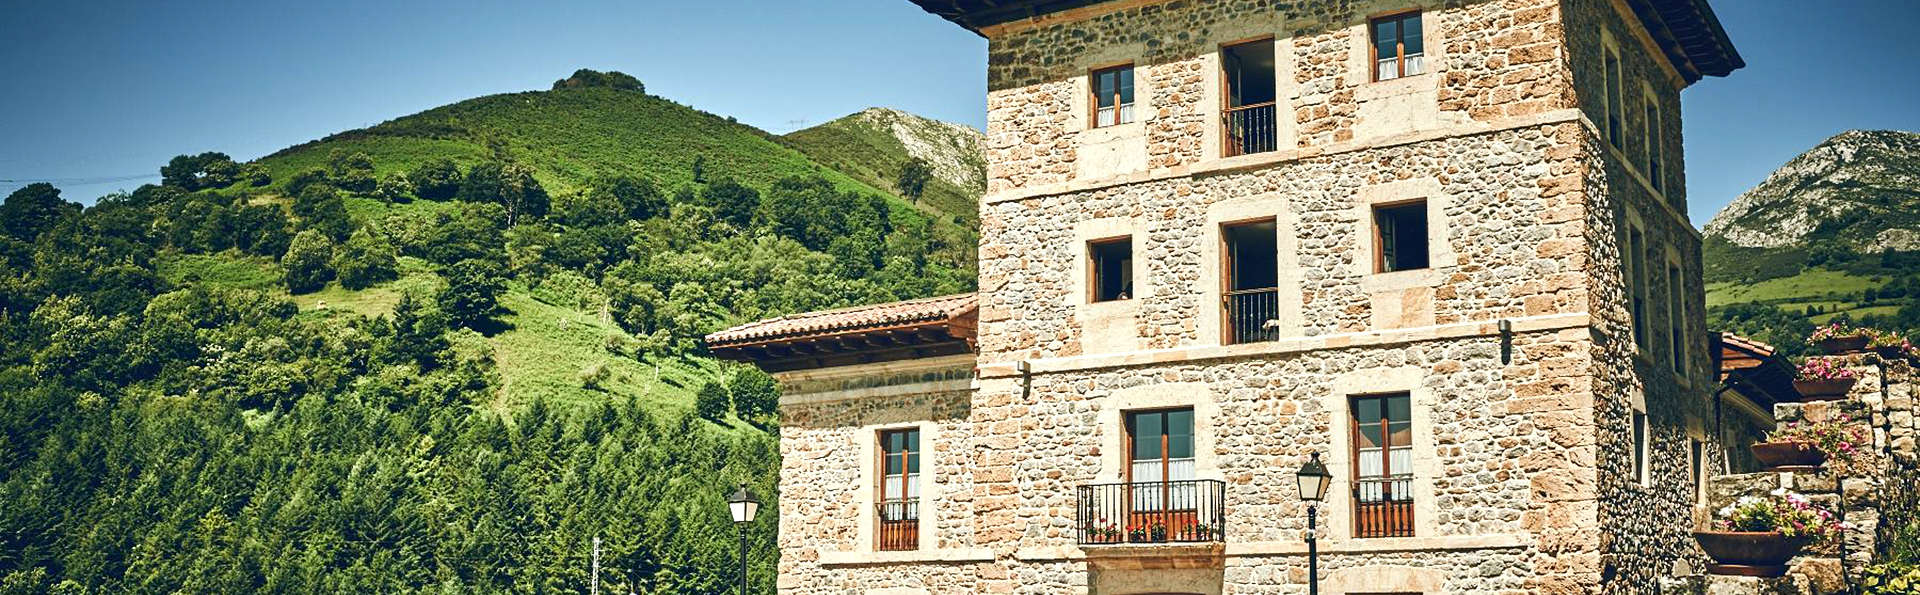 Dîner dans un palais asturien